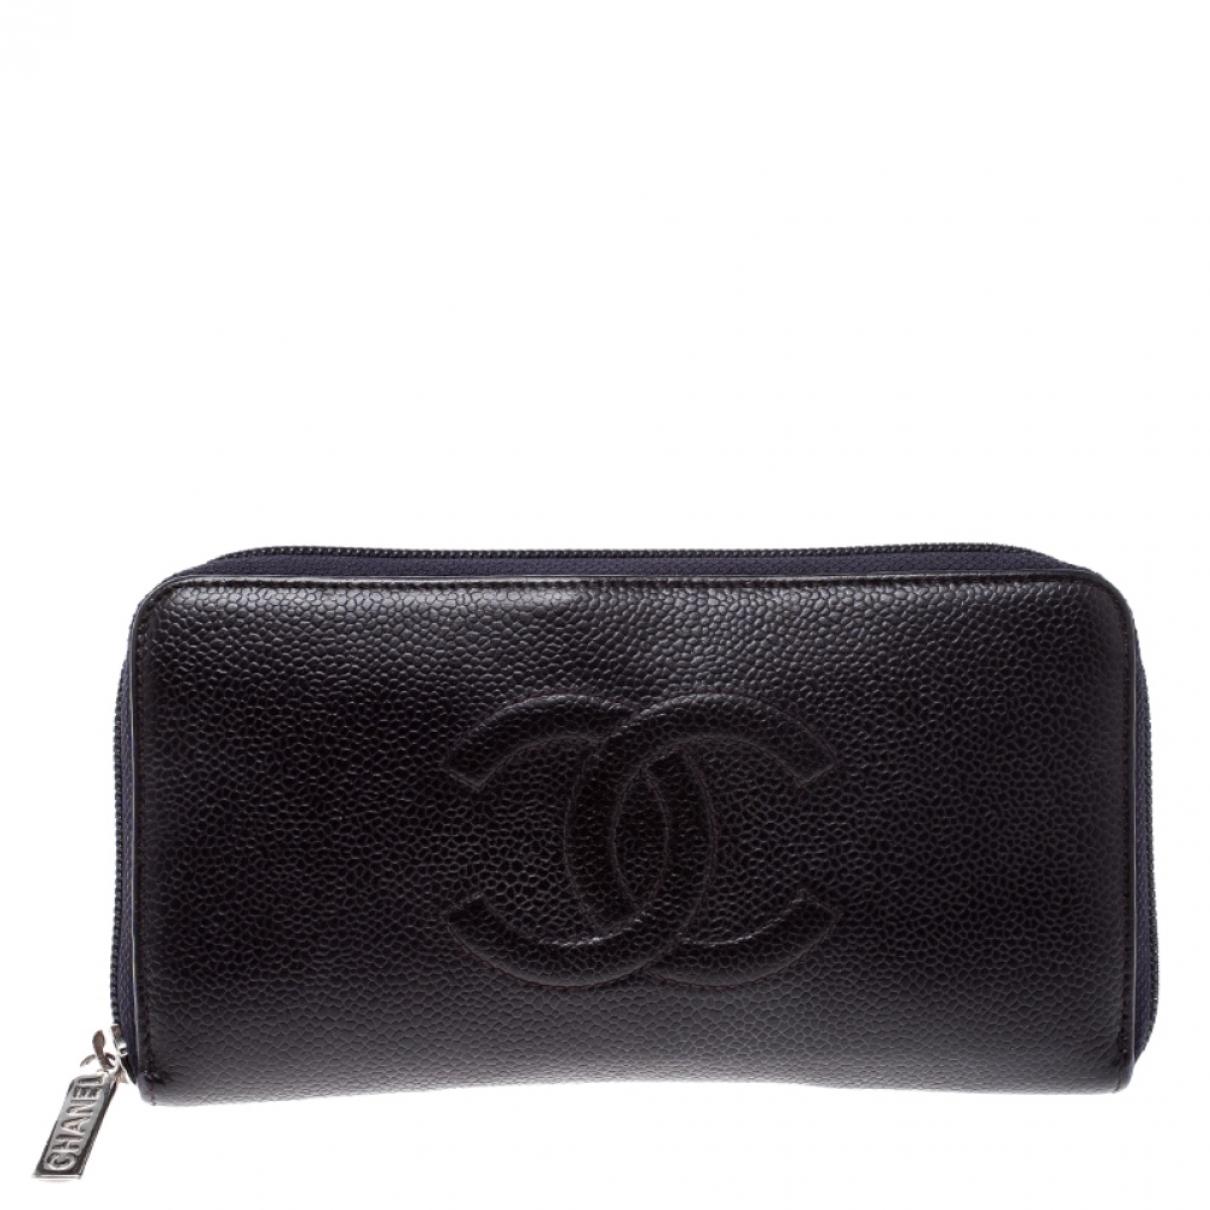 Chanel Timeless/Classique Portemonnaie in  Lila Leder